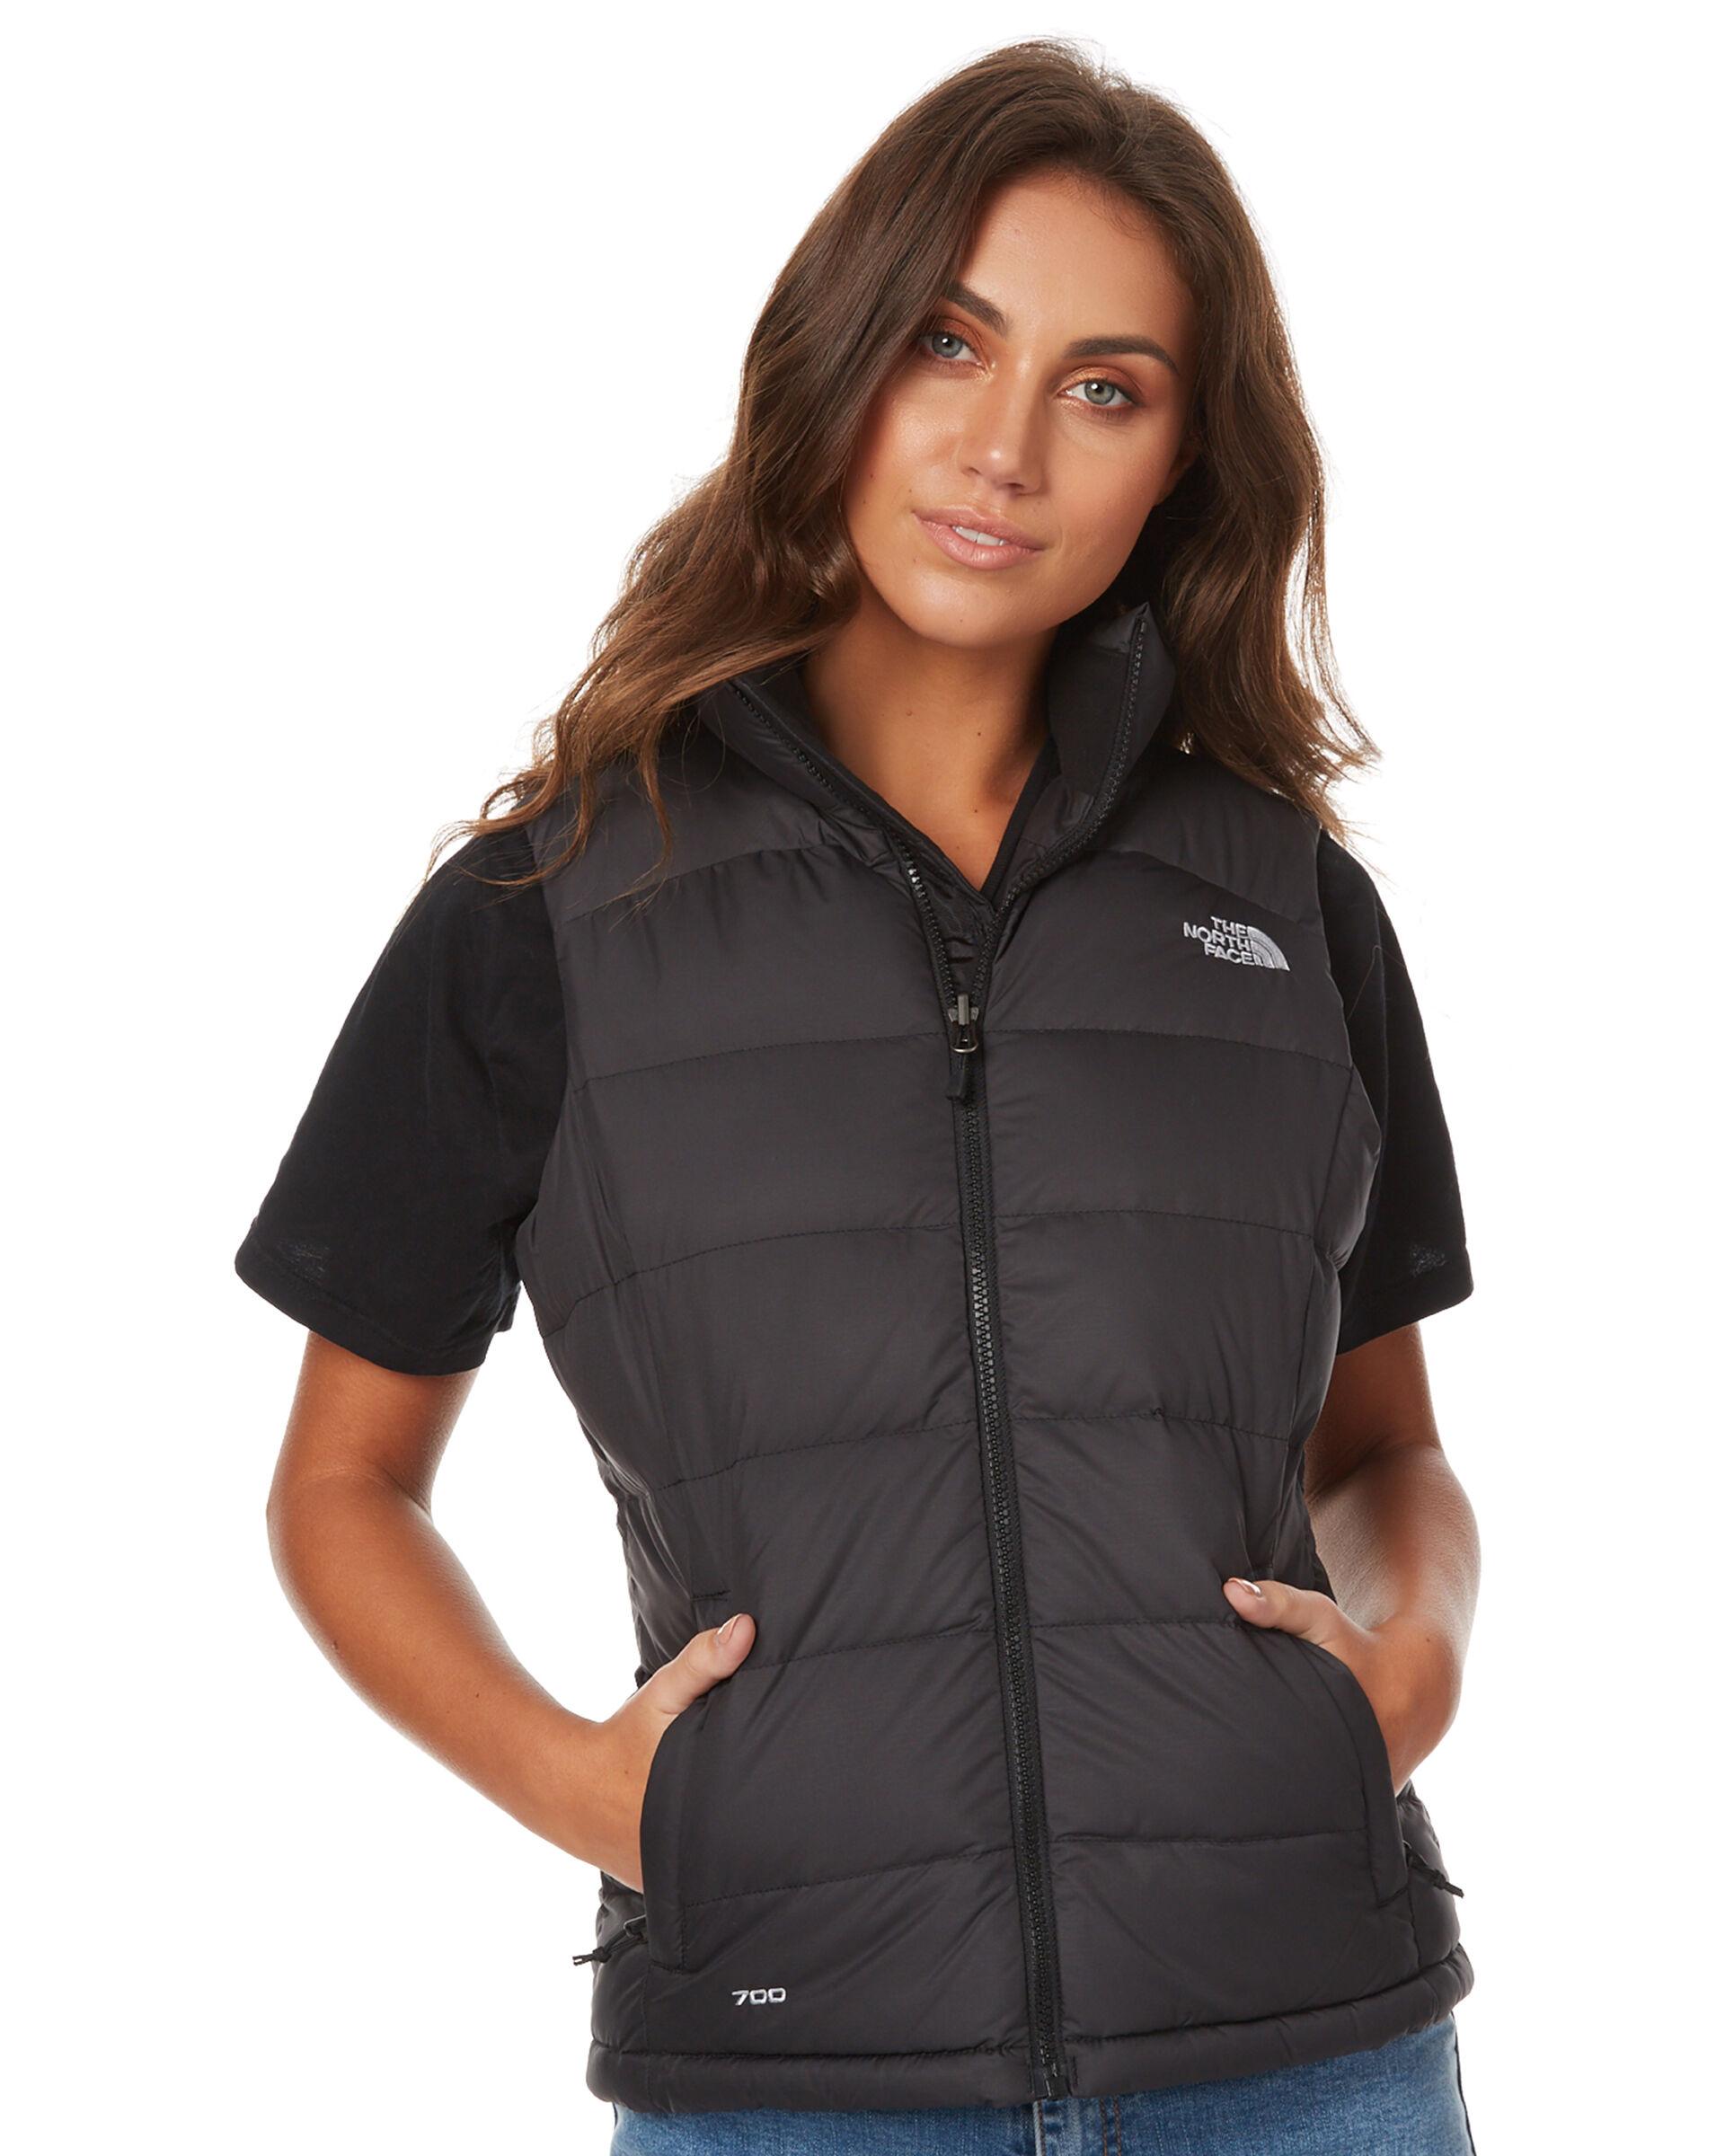 cheapest the north face womens nuptse vest cf8b1 4e02e  order tnf black  womens clothing the north face jackets cuq6jk3 c3ddd a1795 22c68be07